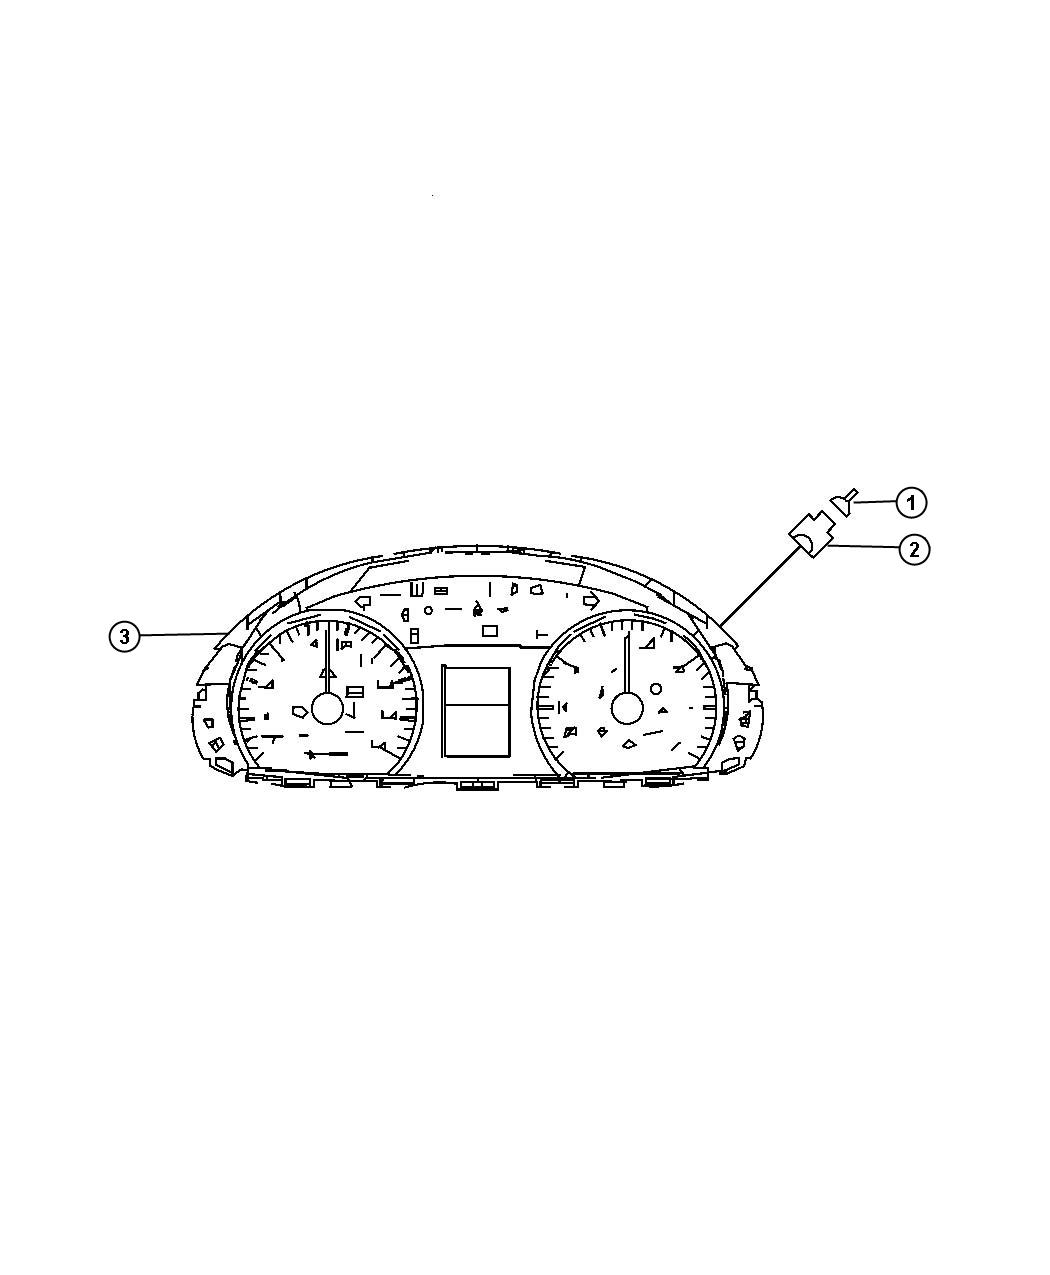 Dodge Sprinter Cluster Instrument Panel With